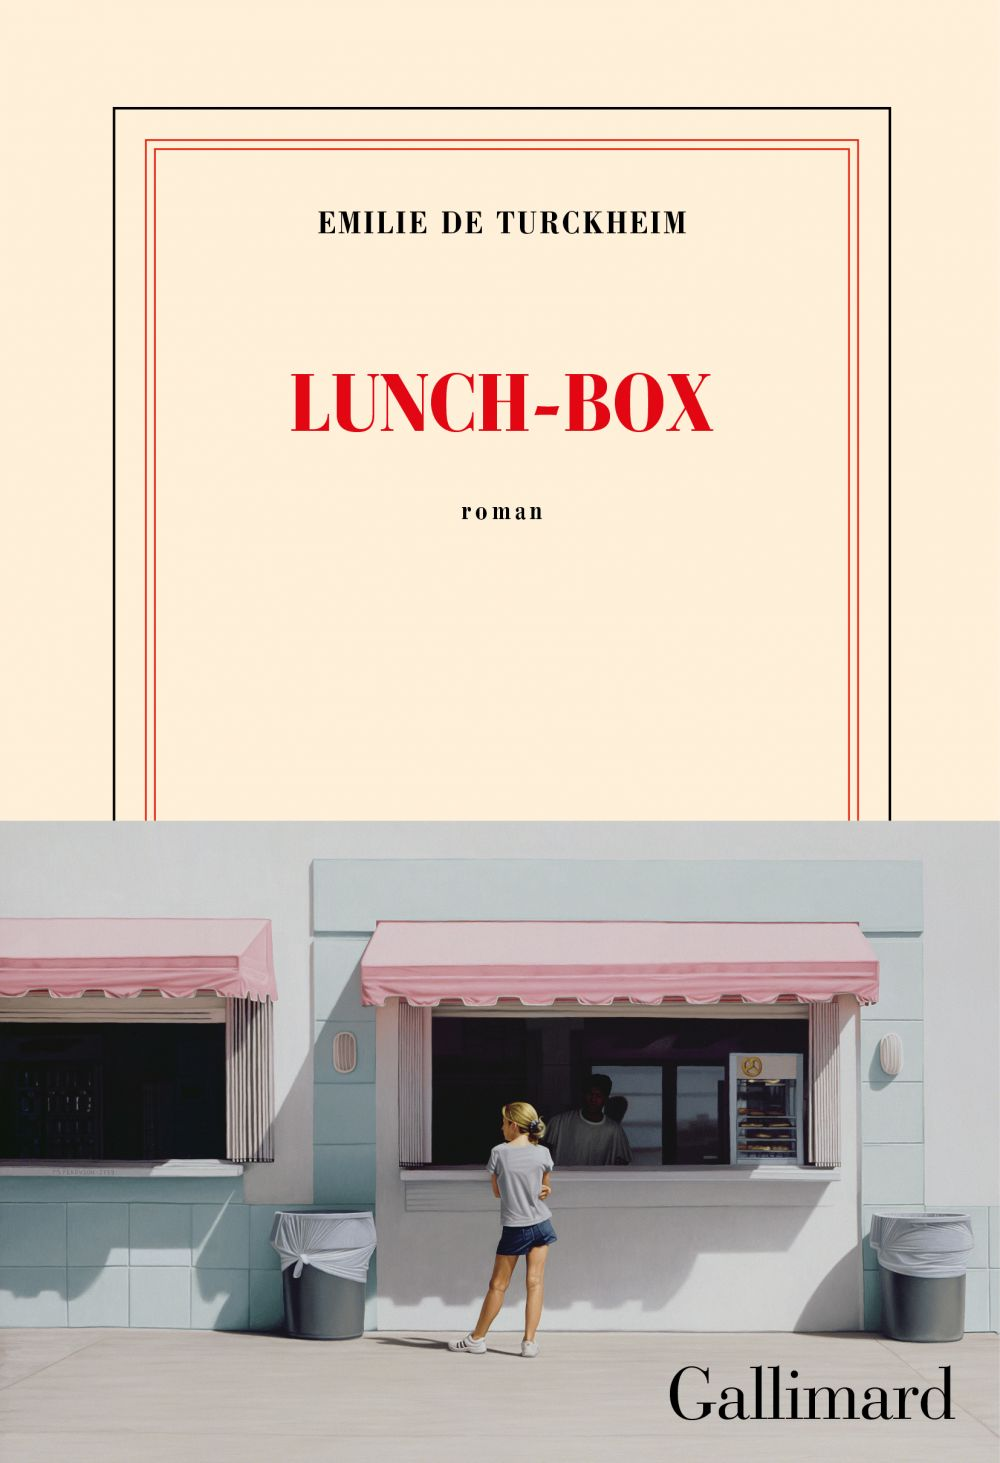 Lunch-box |